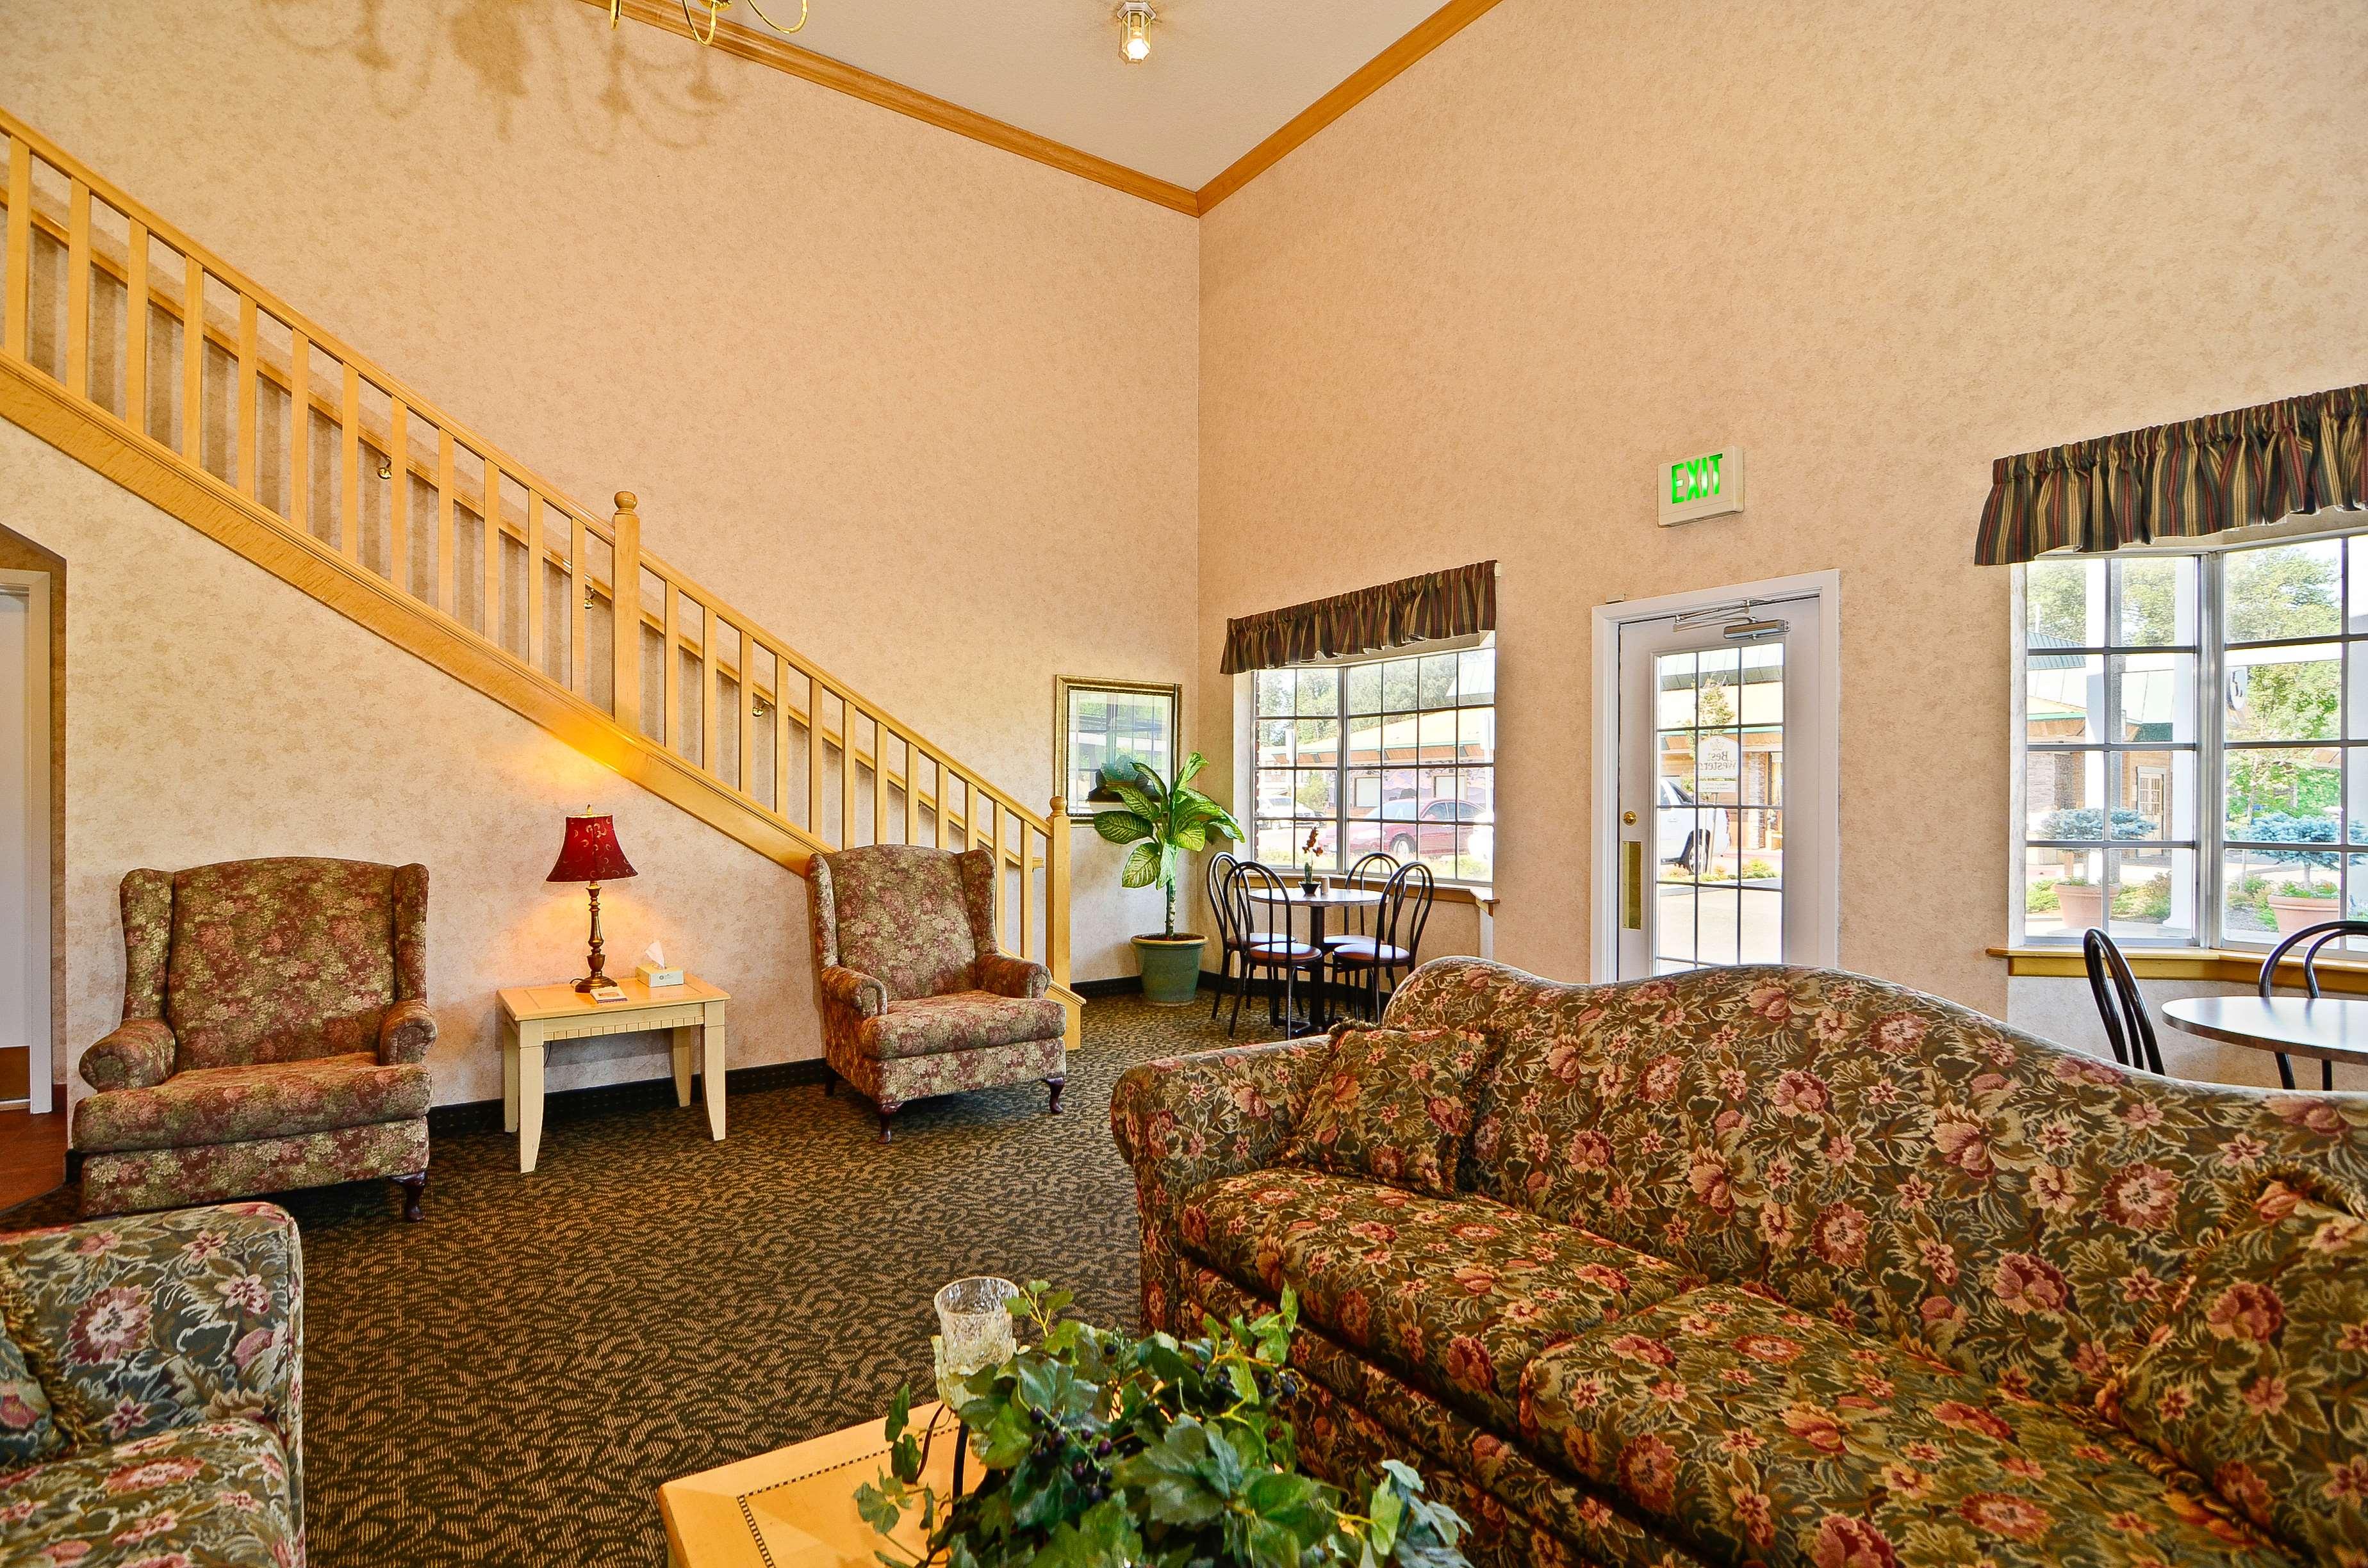 Best Western Horizon Inn image 40